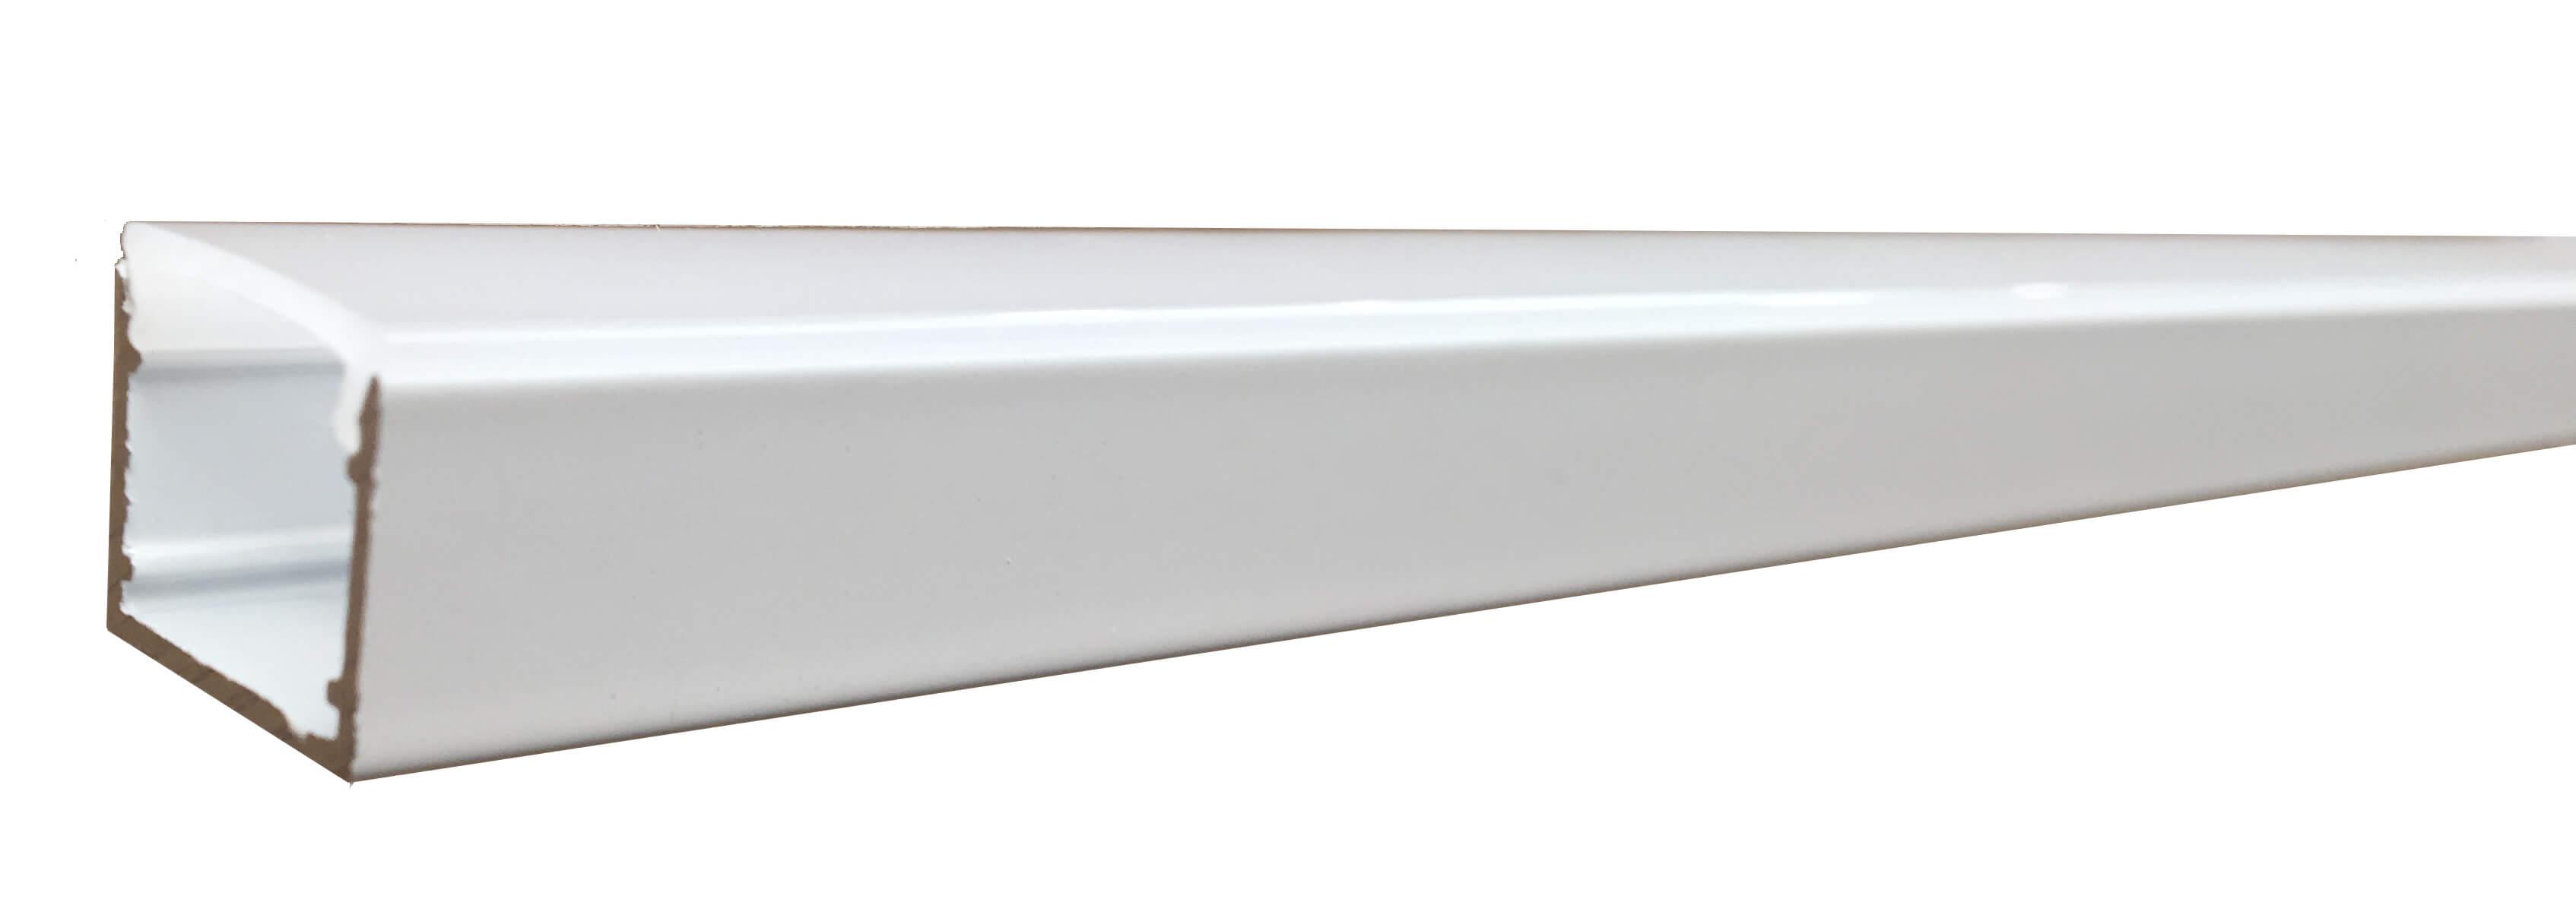 Integratech alu baseline aluminium led strip